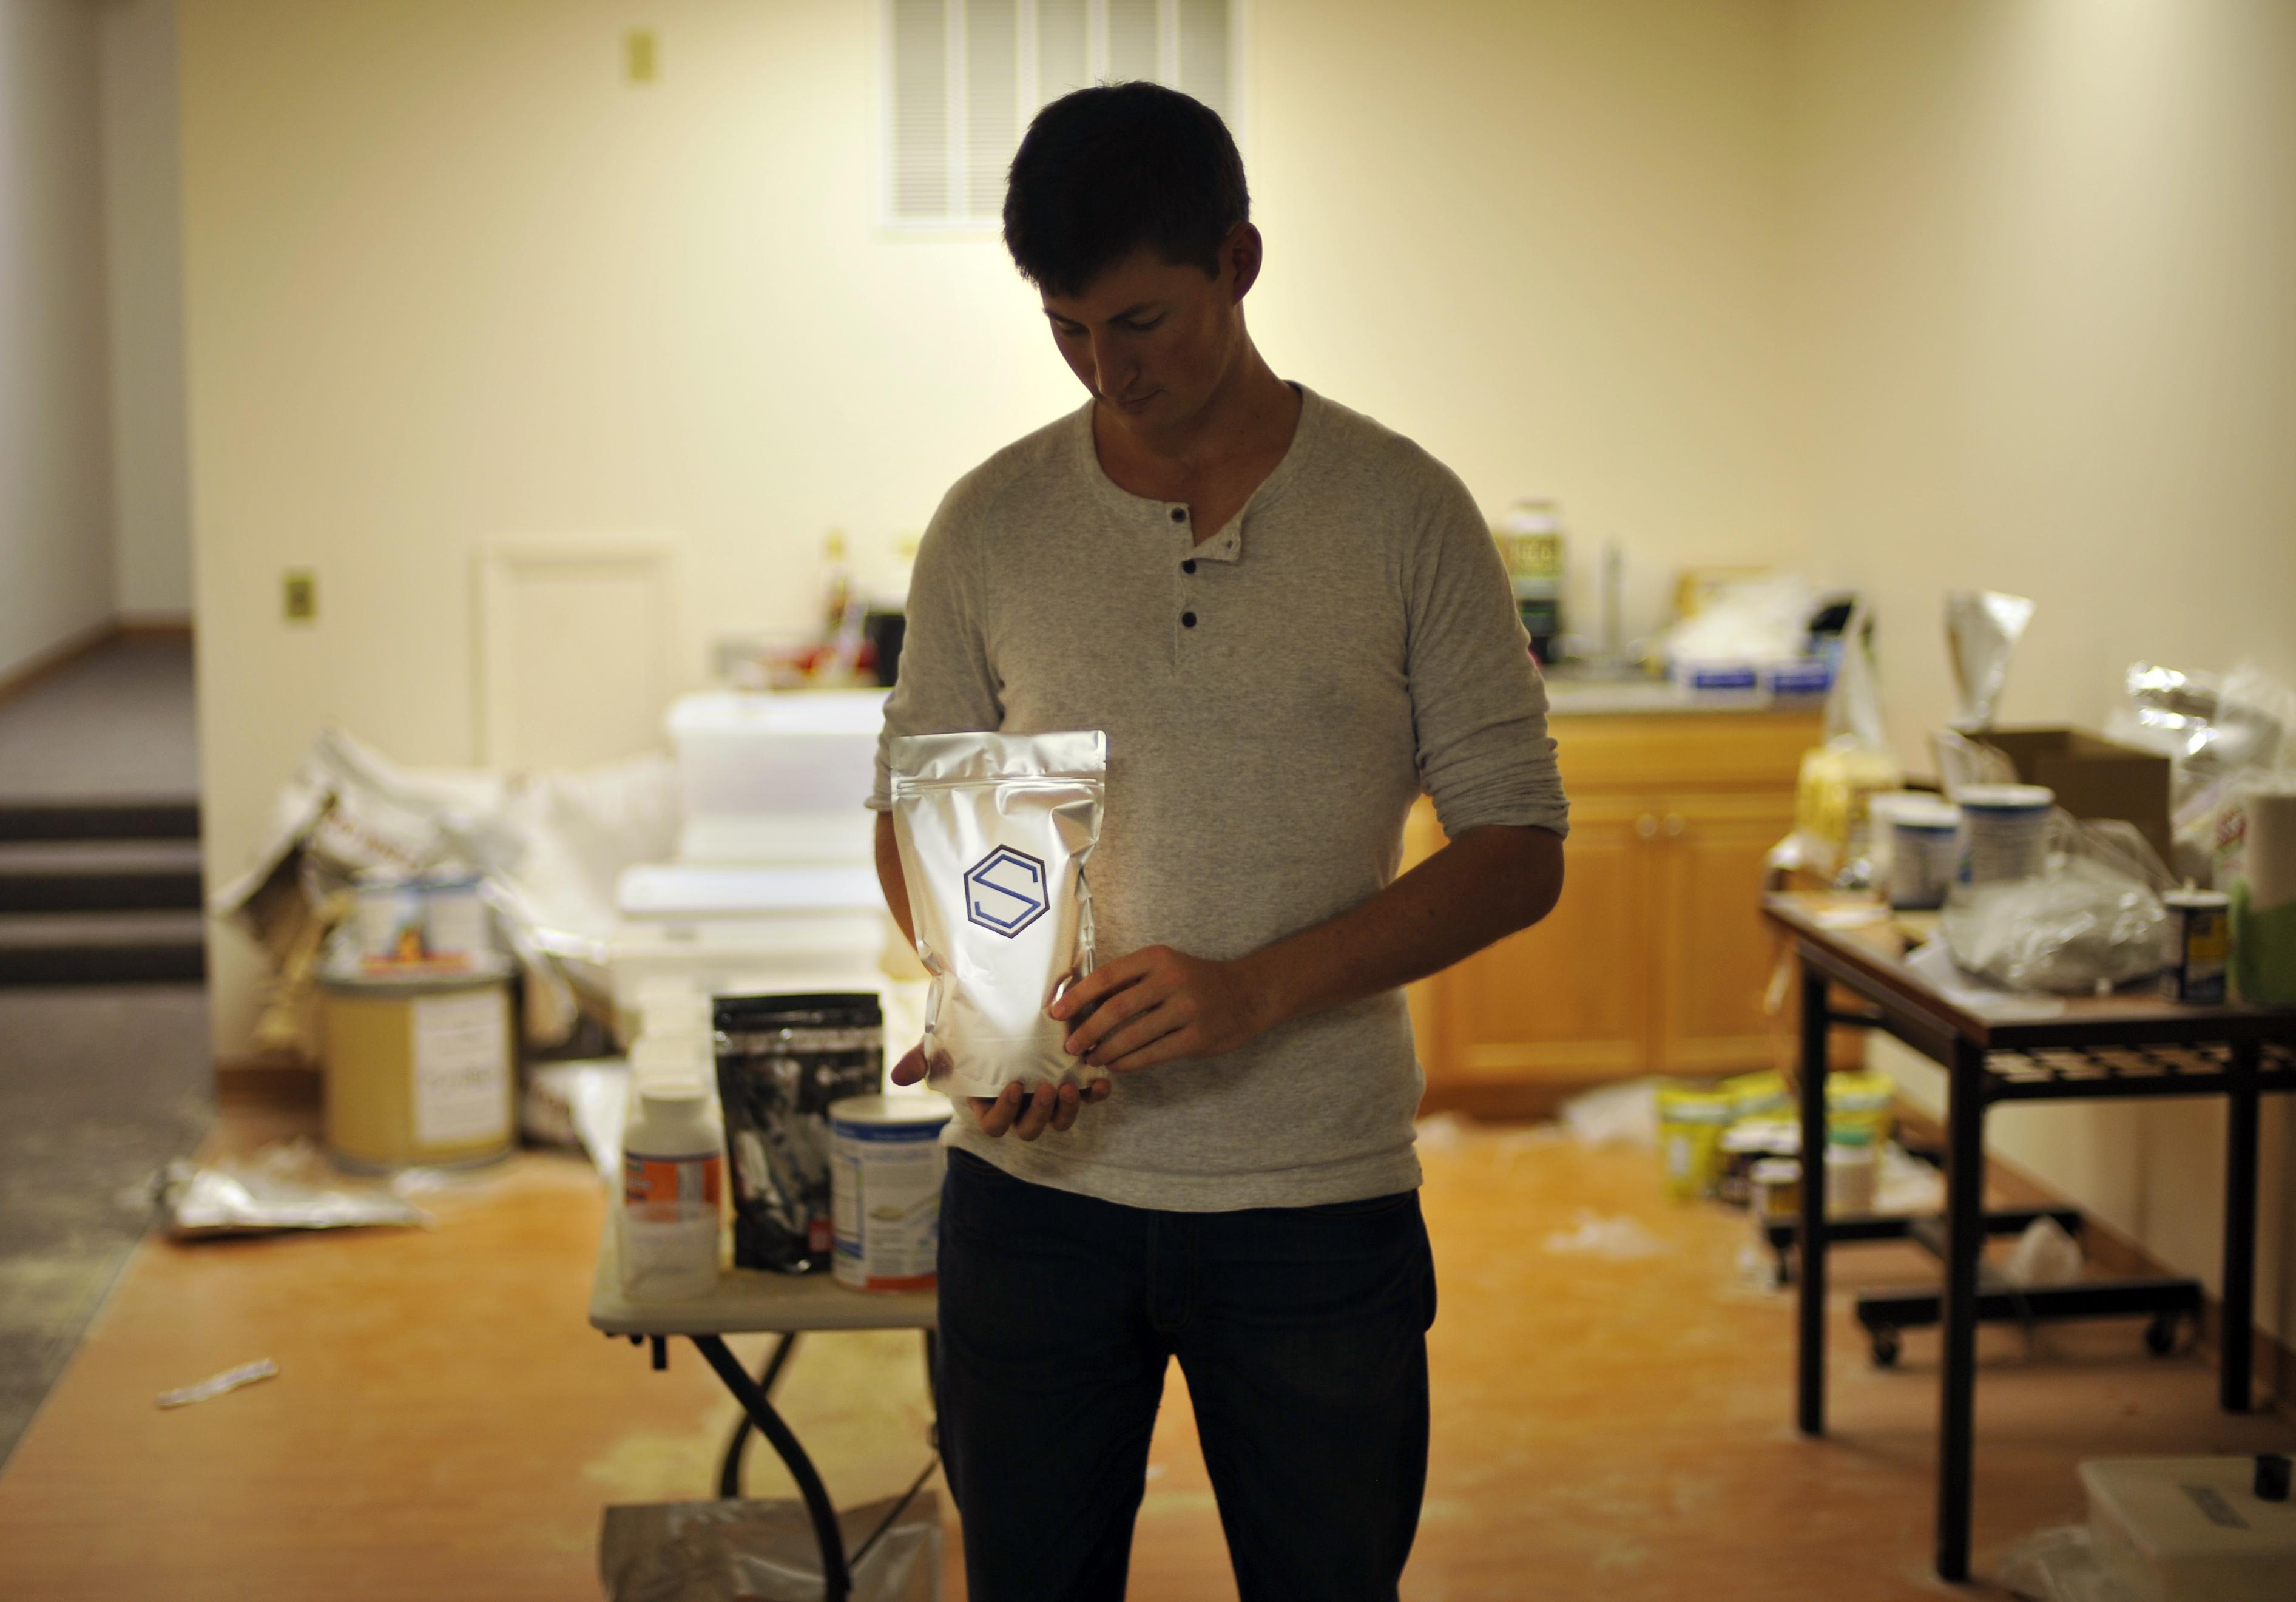 Soylent CEO Rob Rhinehart at his warehouse in Oakland, California, in 2013.